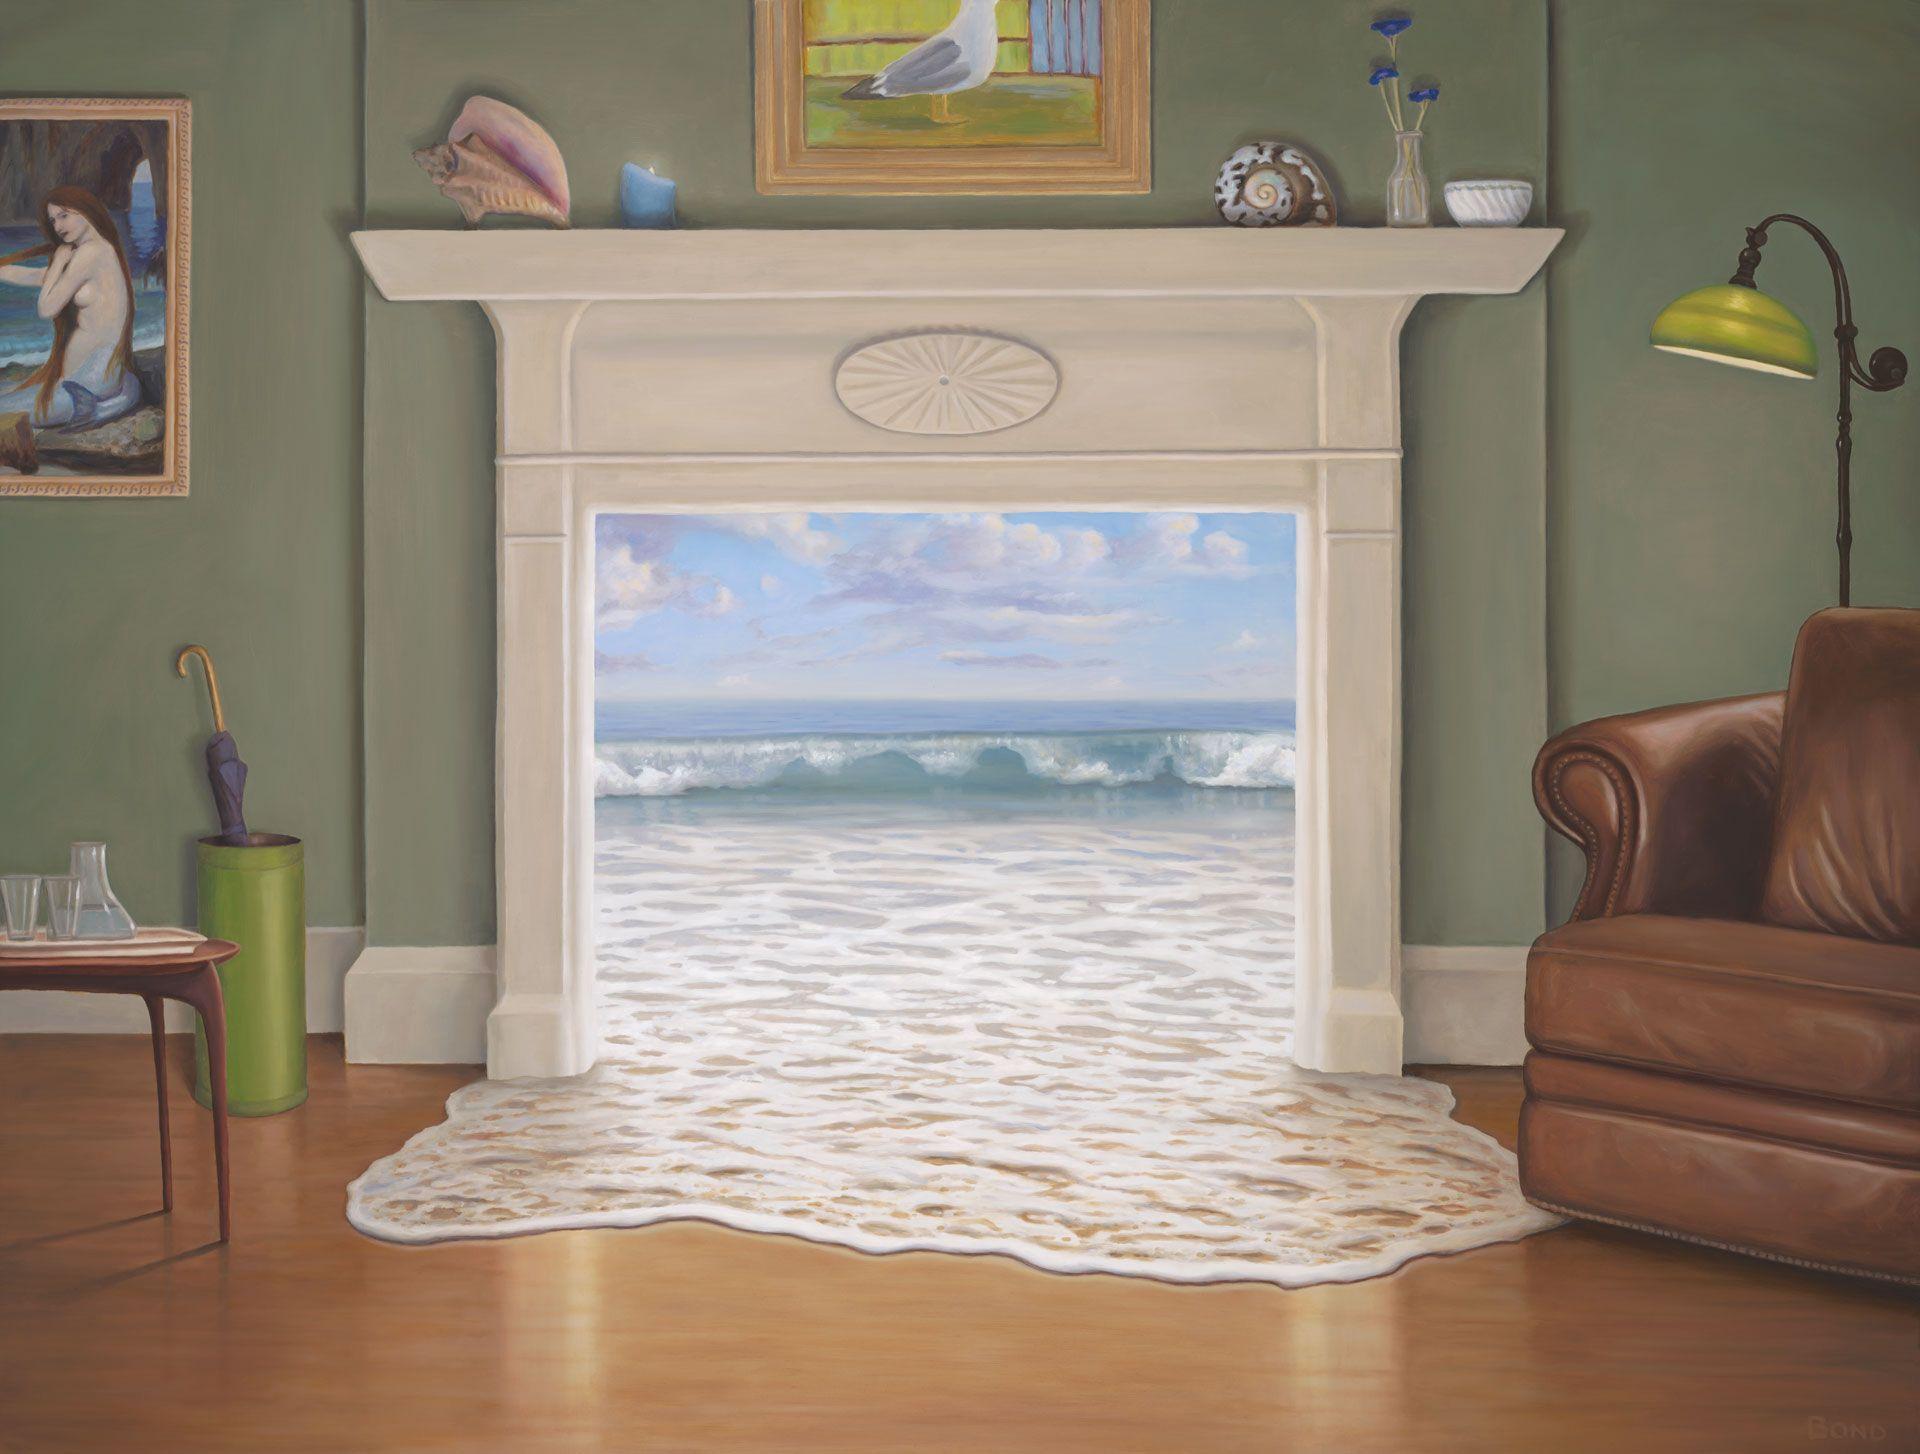 Pin On Adventure Scenery Living room surrealsim realism